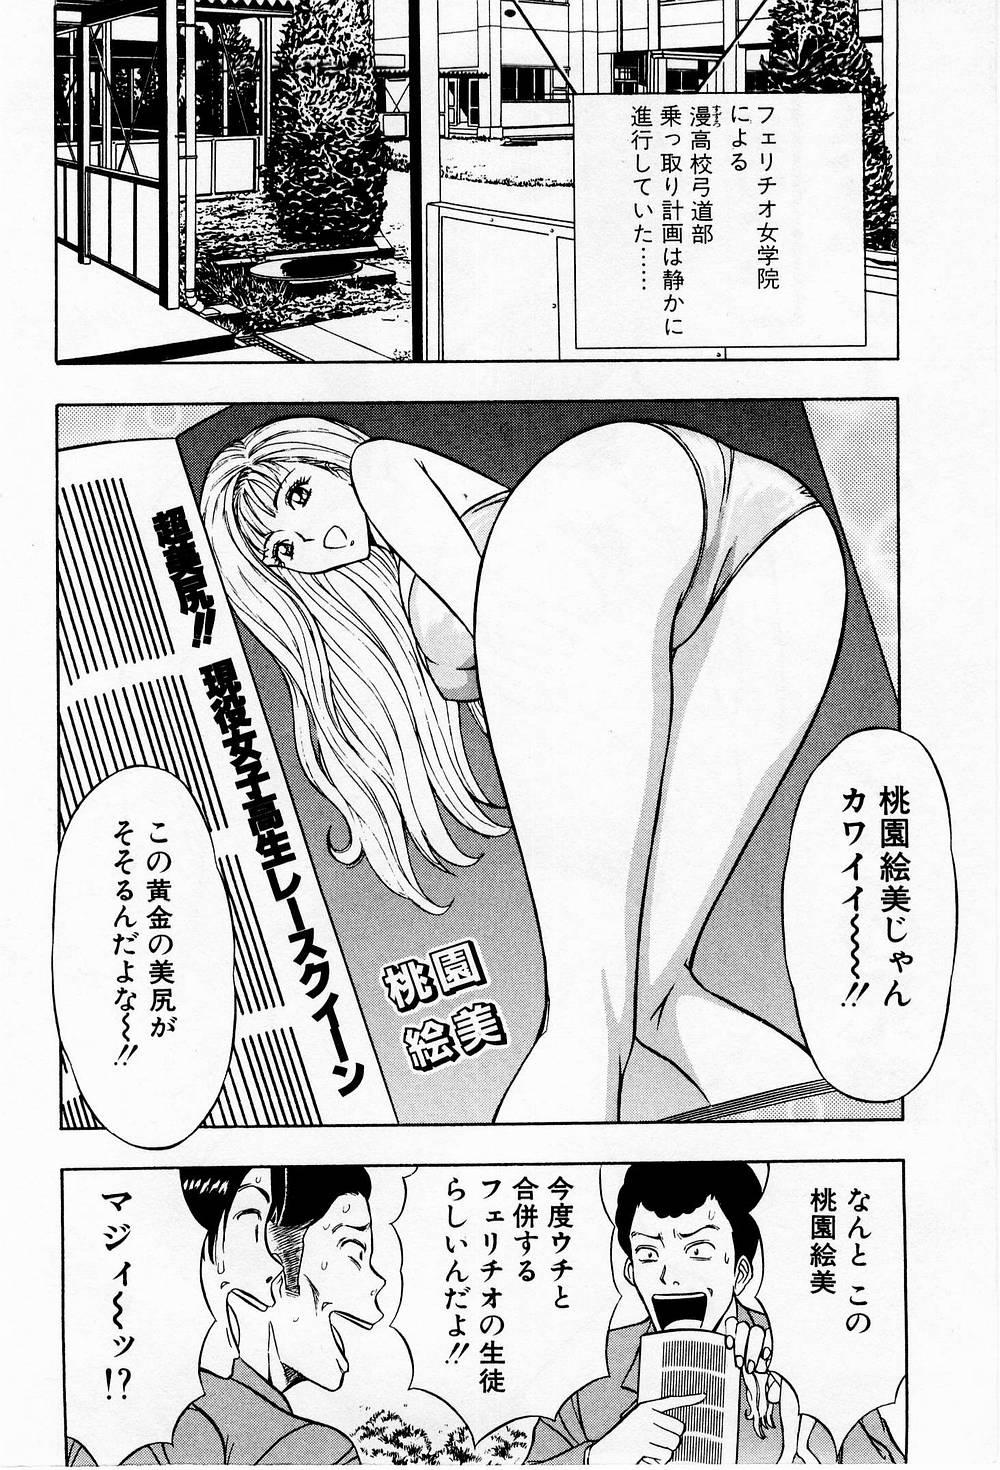 Bakusha Kyuudou Men 3 5